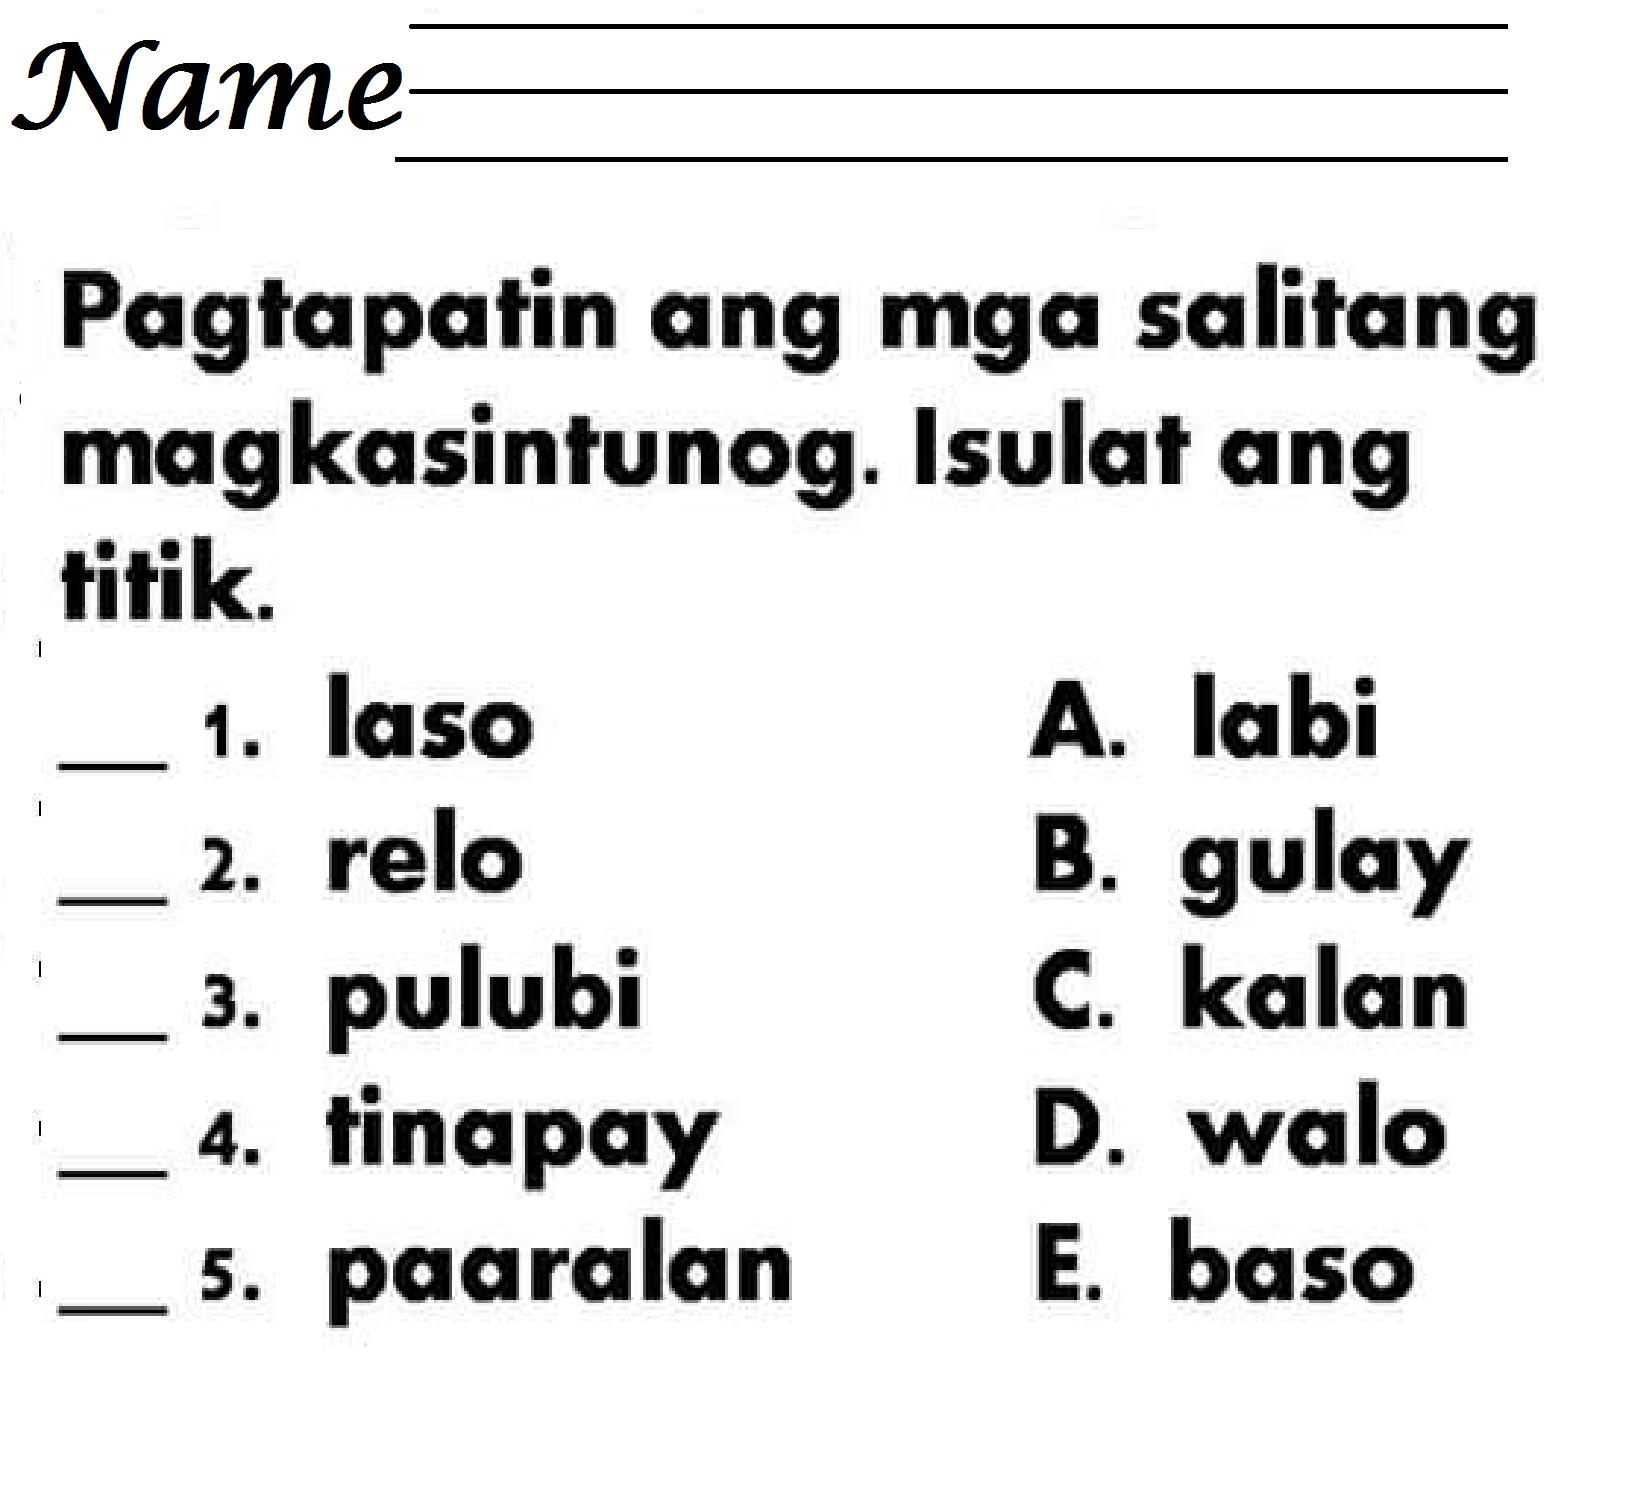 small resolution of 12 Mother Tongue Basic (Tagalog) ideas   tagalog